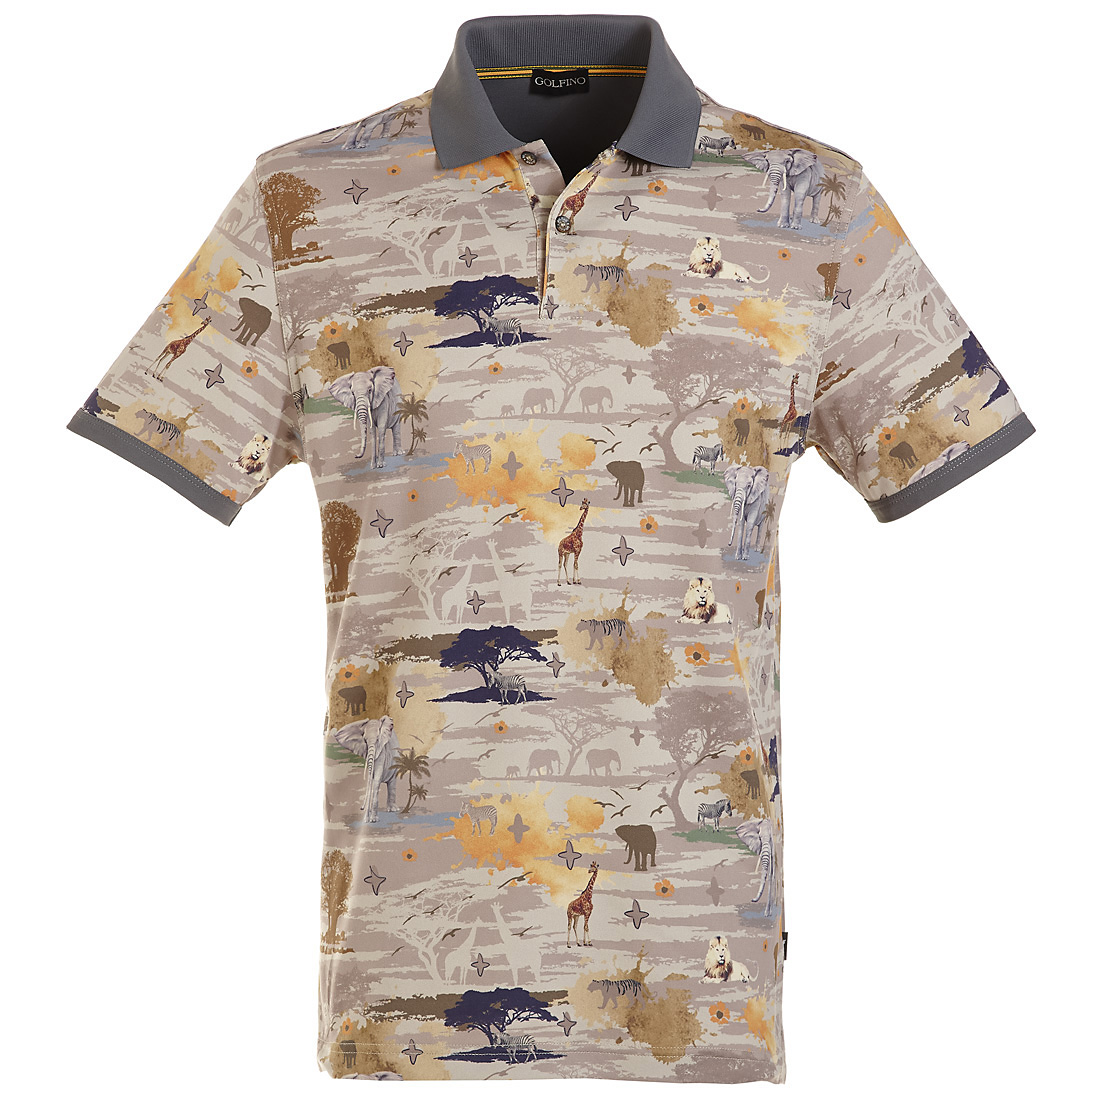 Bedrucktes Extra Dry Poloshirt